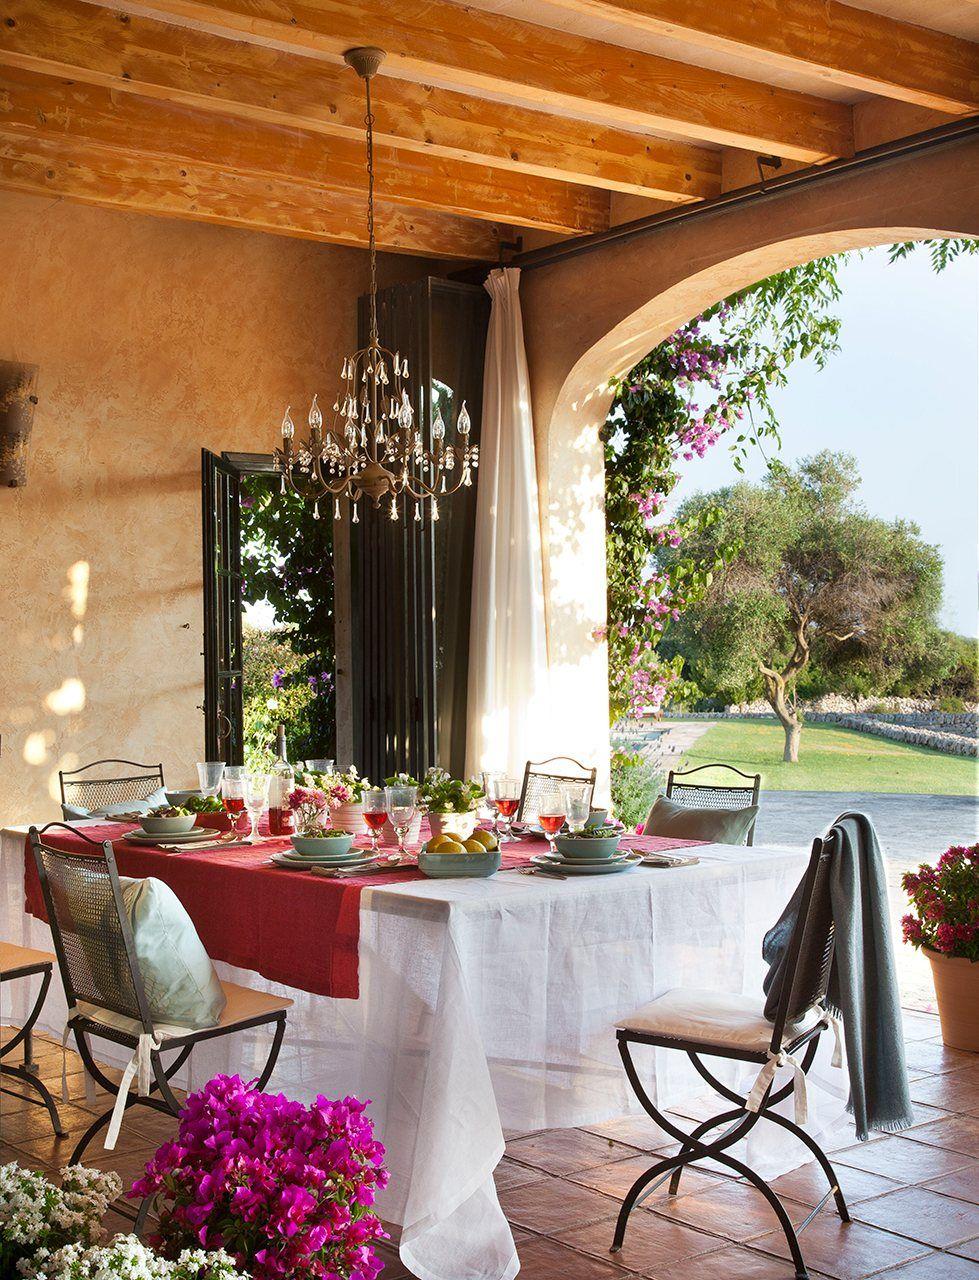 4 comedores de verano para inspirarte for Comedores de terraza baratos